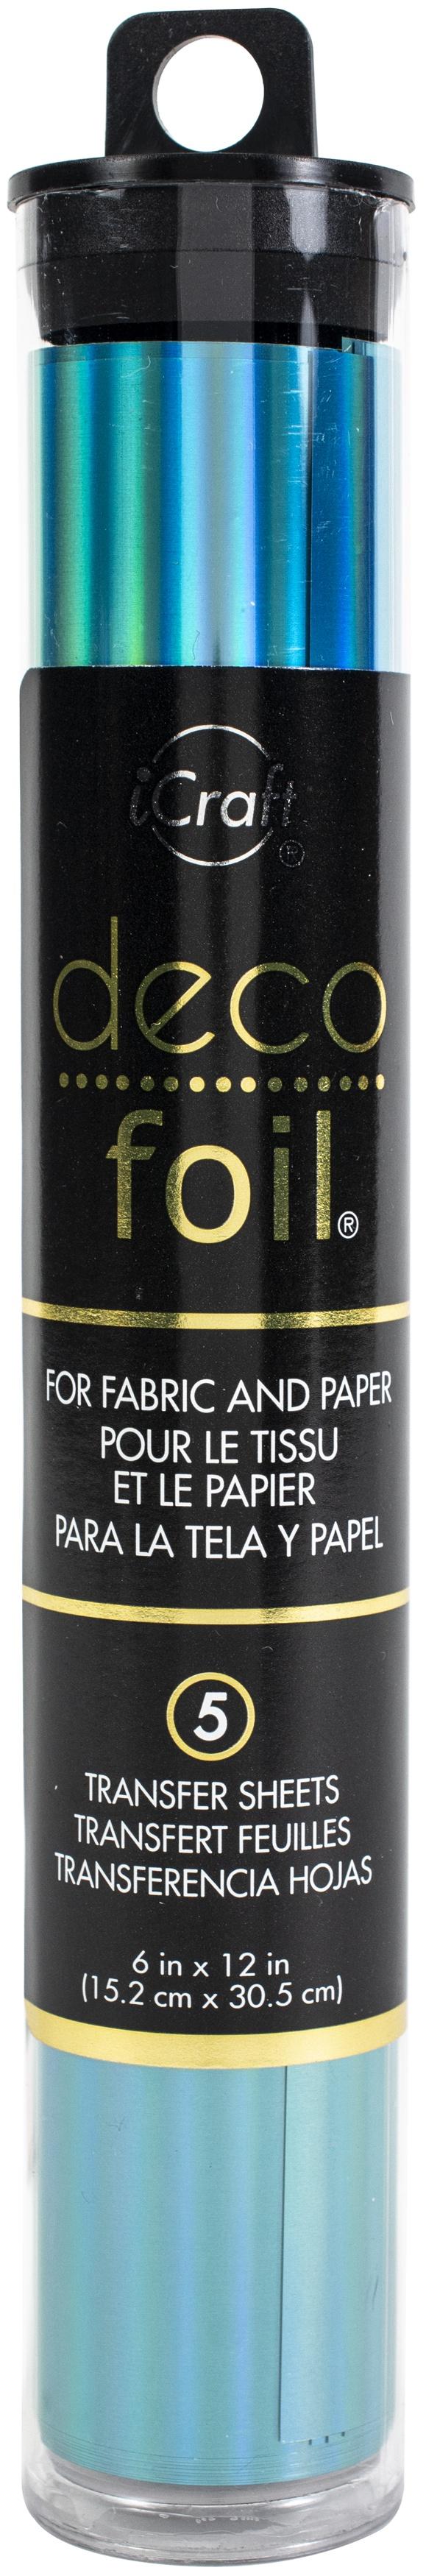 Deco Foil Specialty Transfer Sheets 6X12 5/Pkg-Glass Slipper